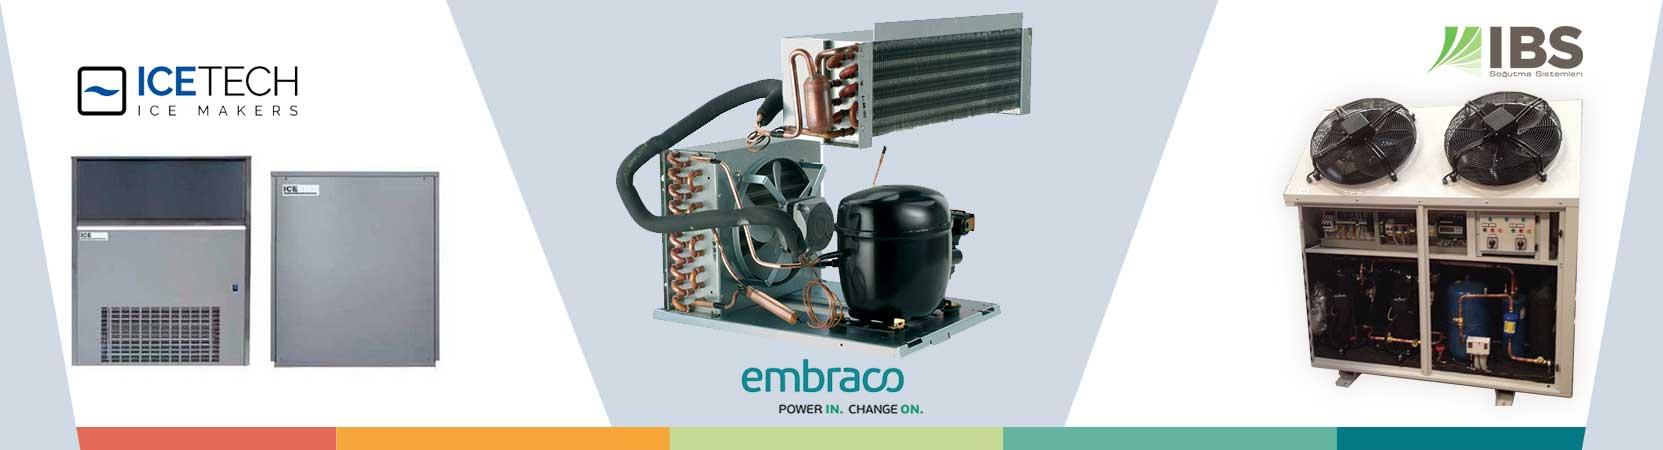 Пълен асортимент от <strong>резервни части, хладилни и климатични компресори, <br>медни тръби, инструменти и консумативи</strong>